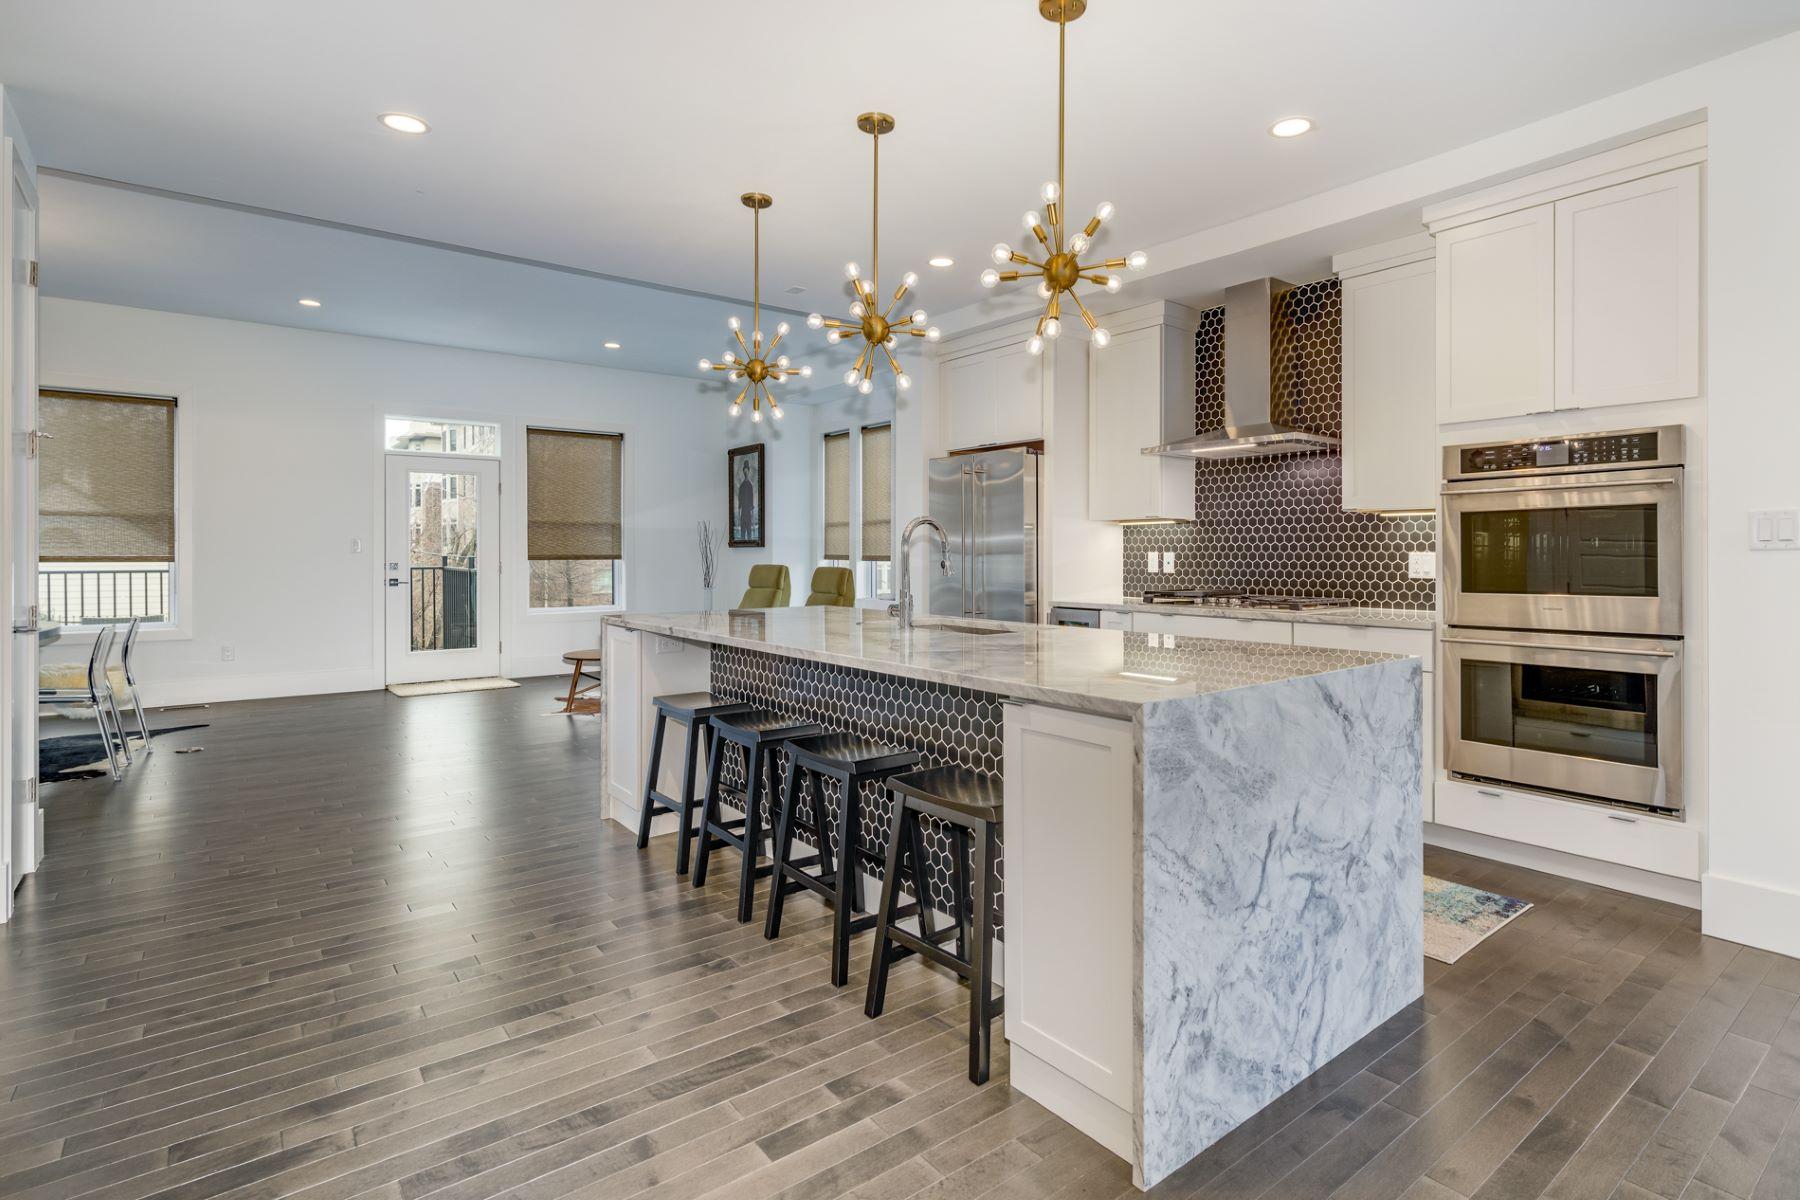 Additional photo for property listing at Delmar Blvd 7634 Delmar Blvd University City, Missouri 63130 United States